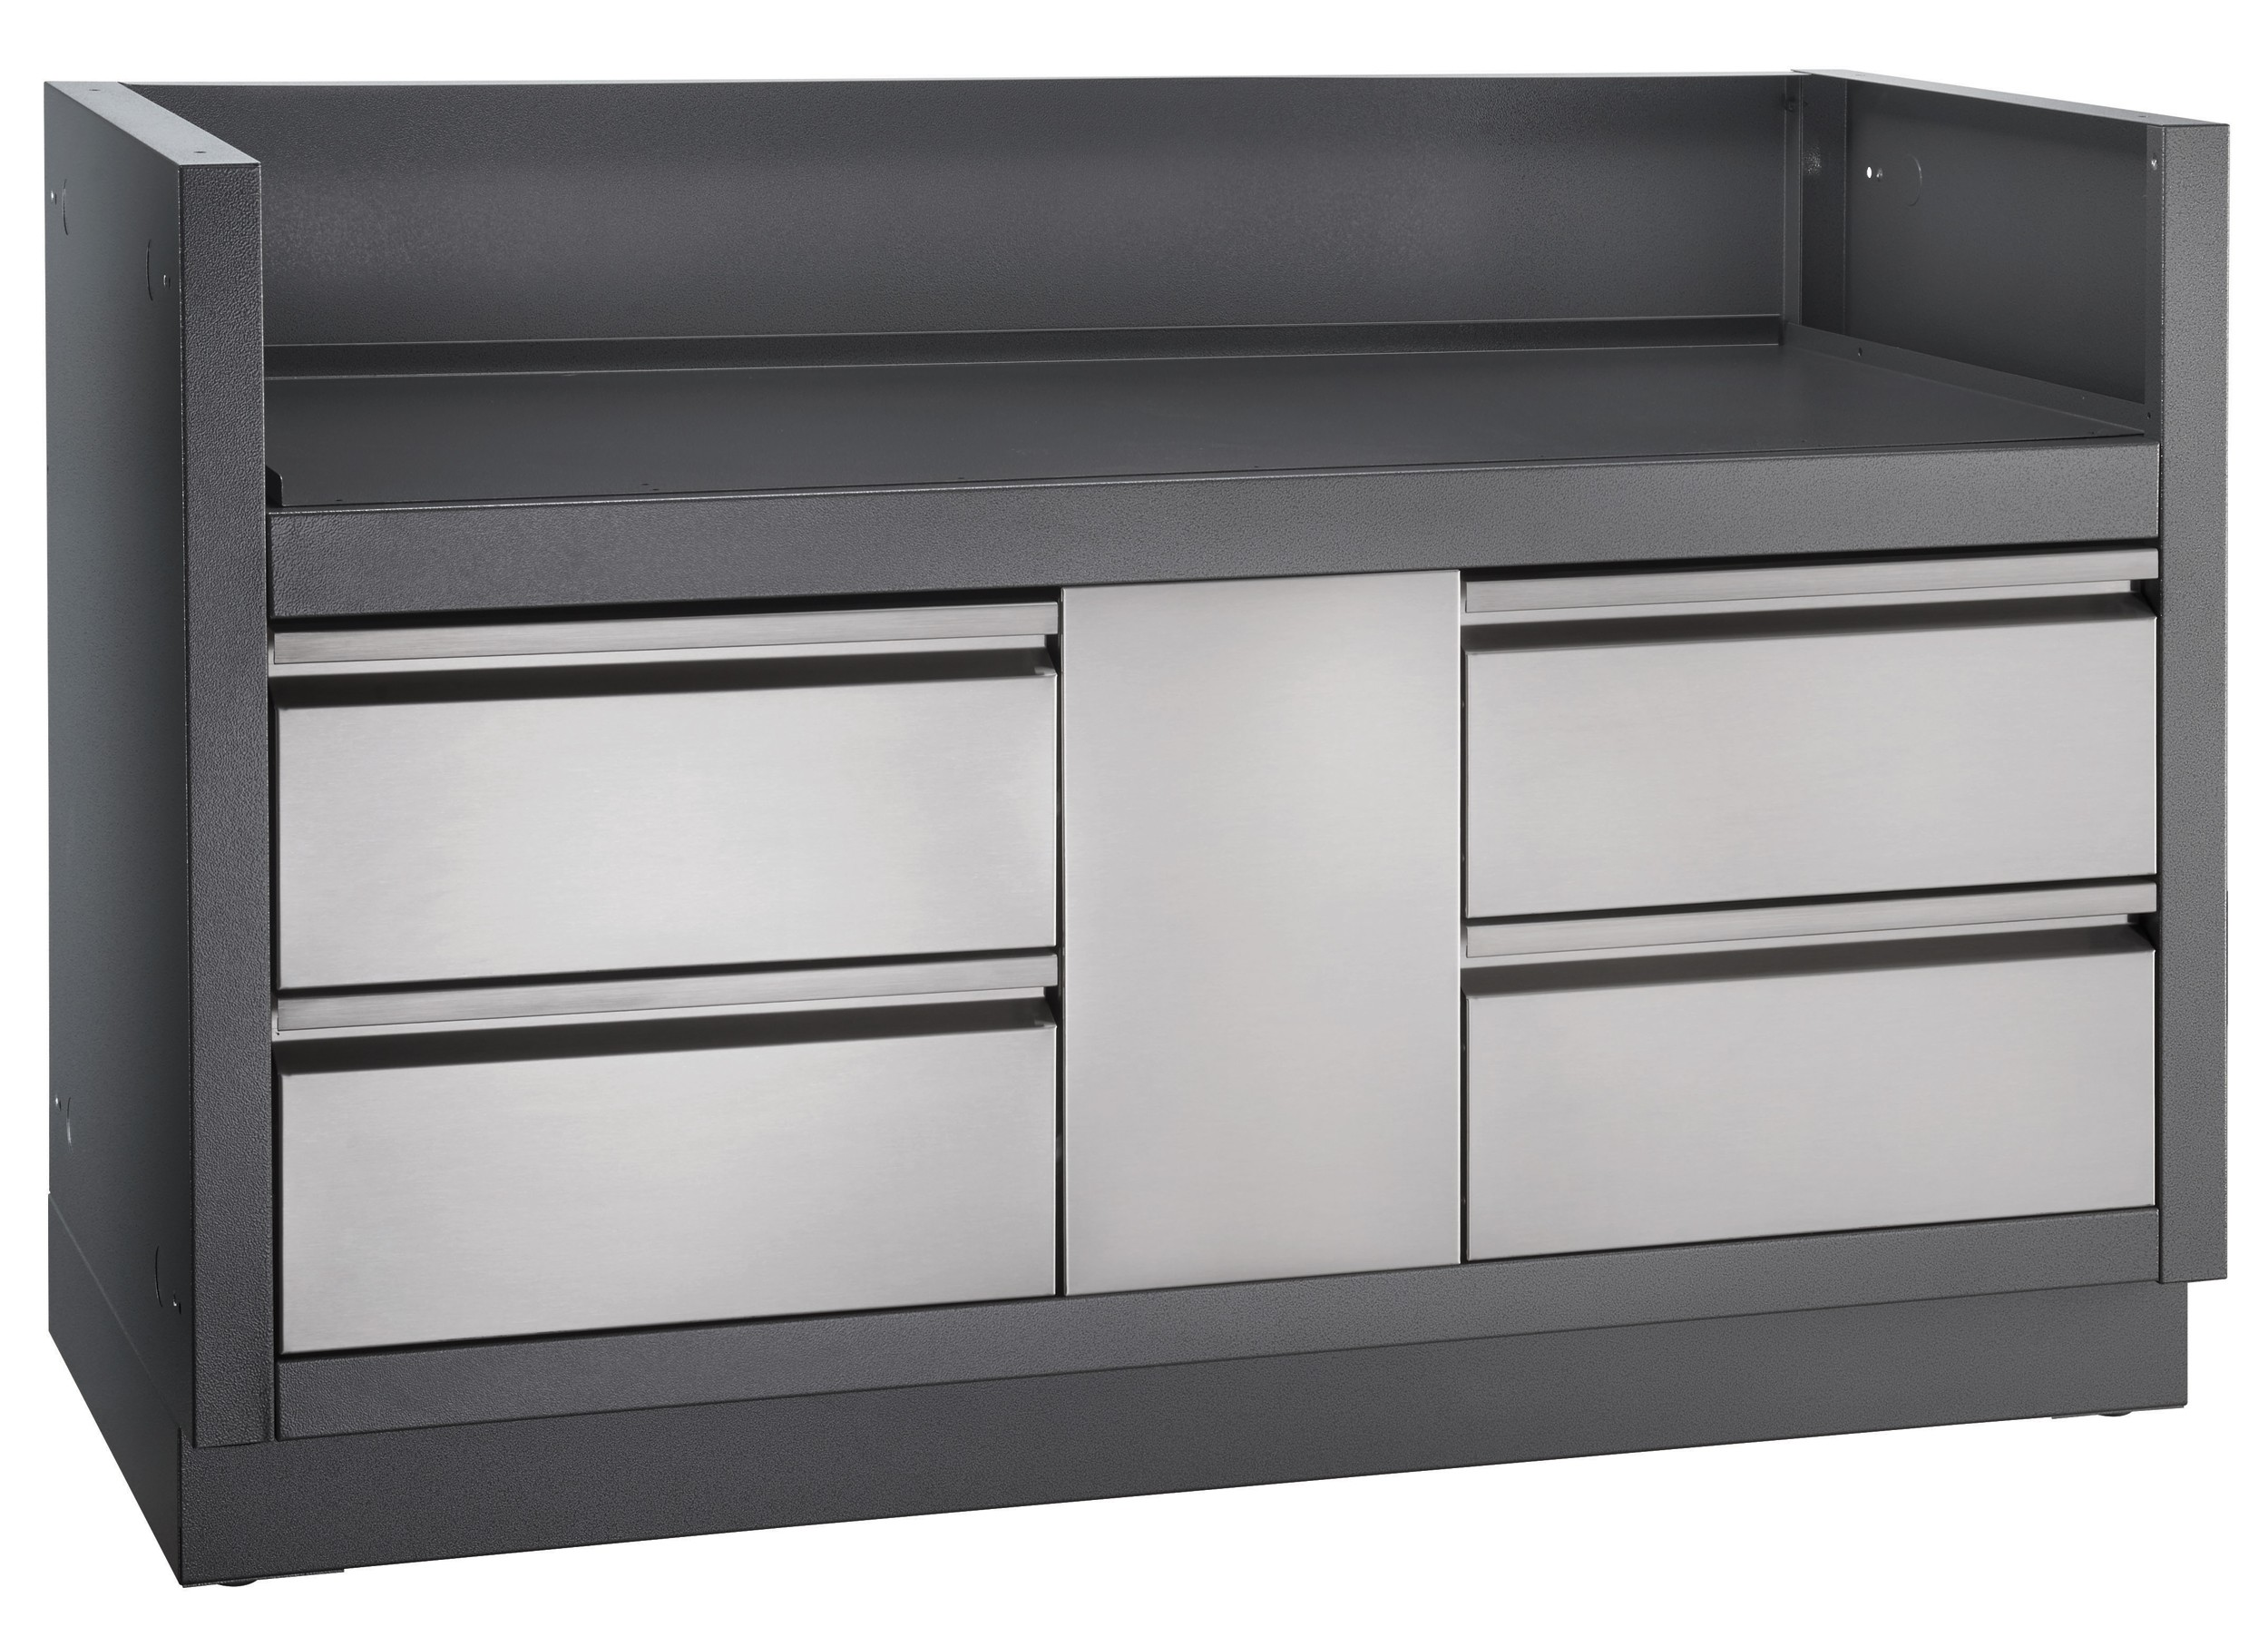 au enk che einbau grill unterschrank napoleon oasis f r. Black Bedroom Furniture Sets. Home Design Ideas